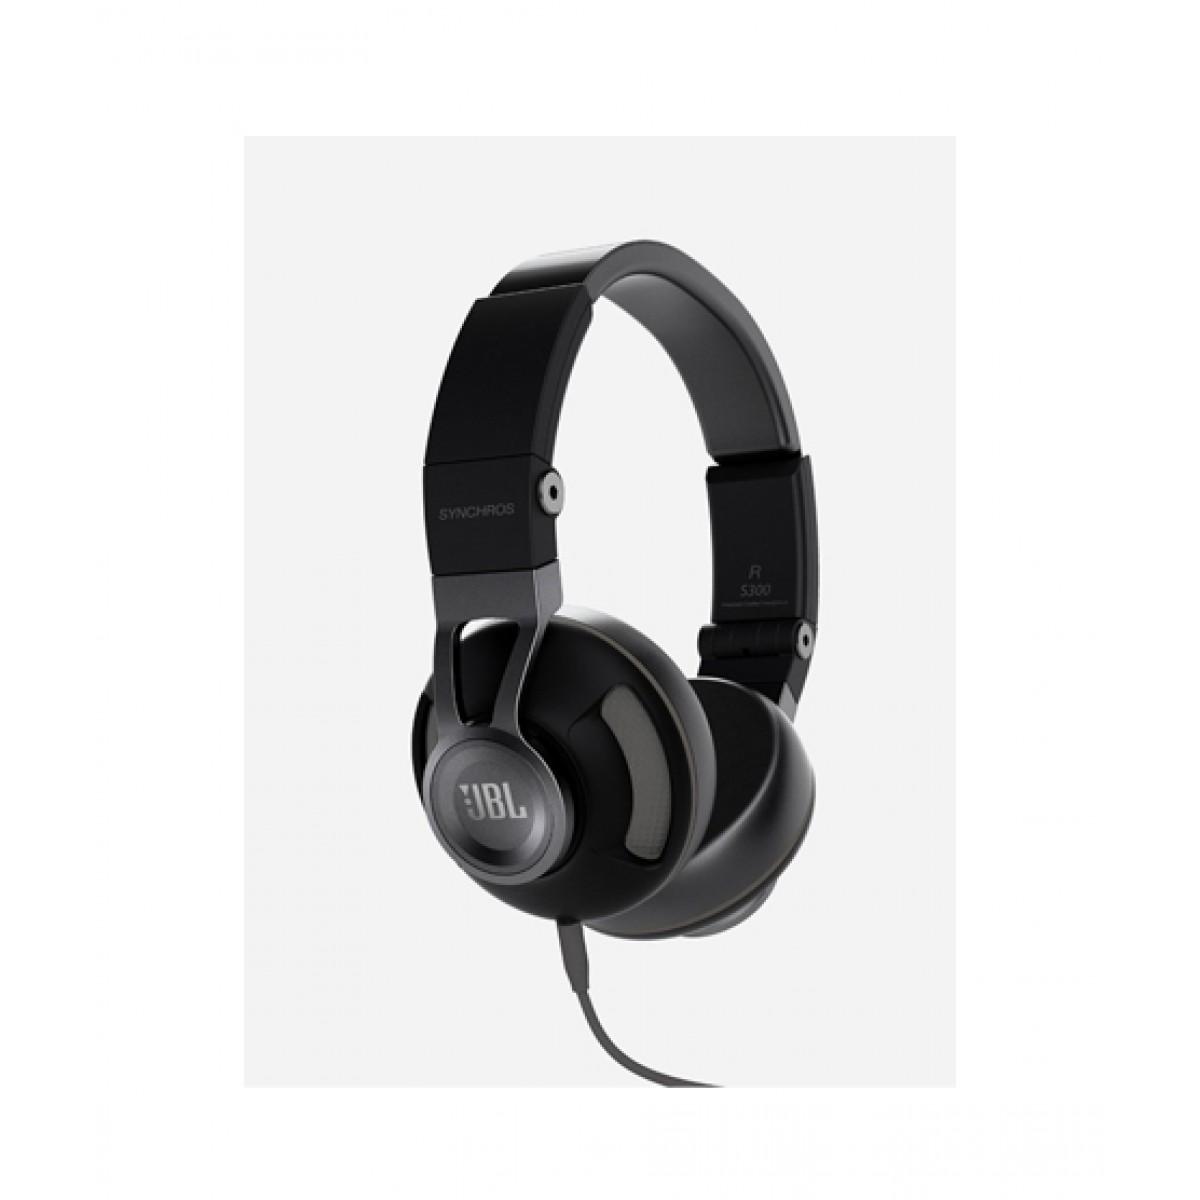 9c9d1879273 JBL Synchros S300i Premium Headphones Price in Pakistan | Buy JBL S300i  Premium On-Ear Headphones Black | iShopping.pk